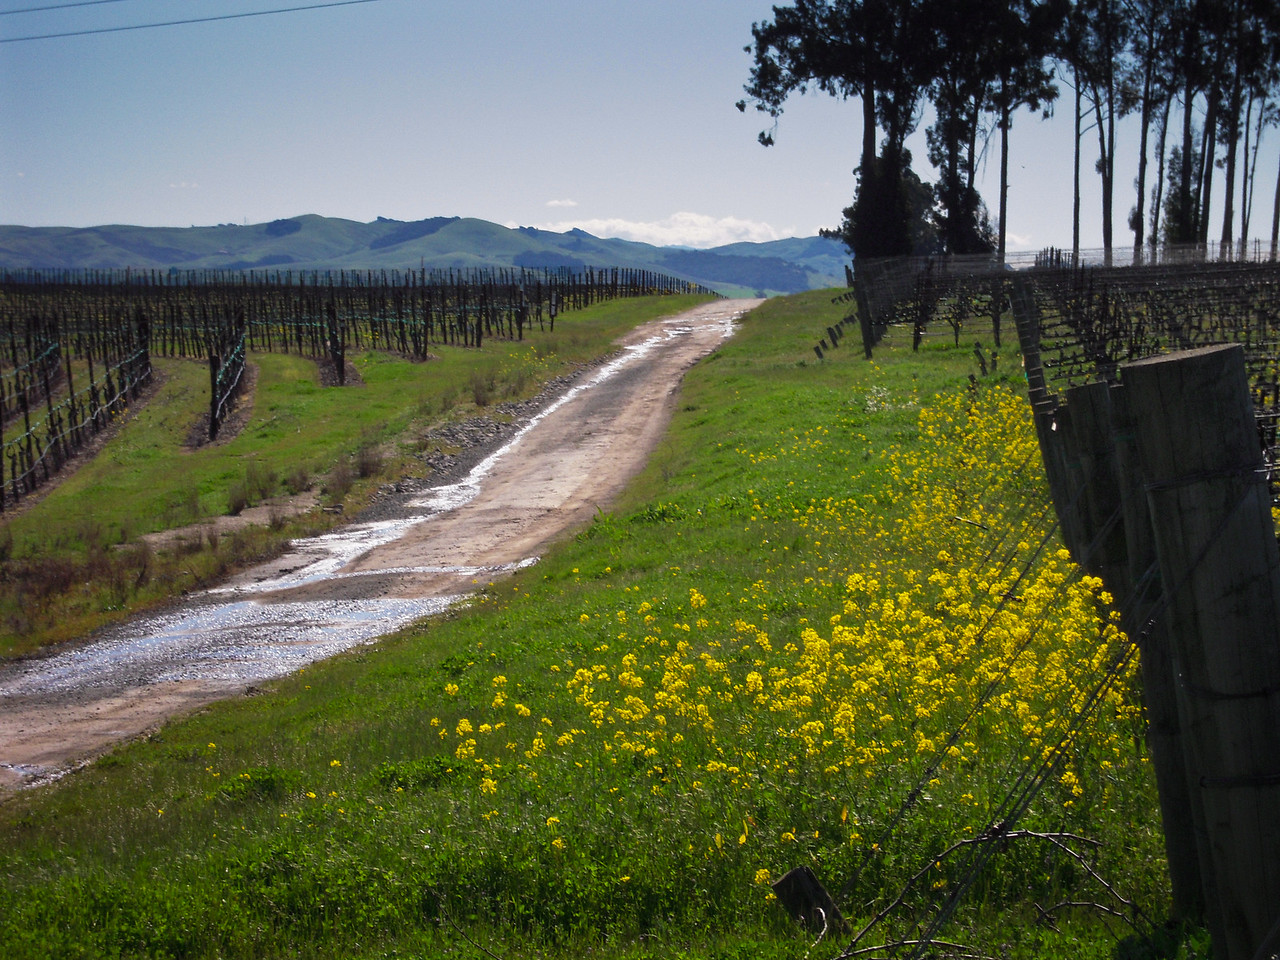 Spring in Carneros